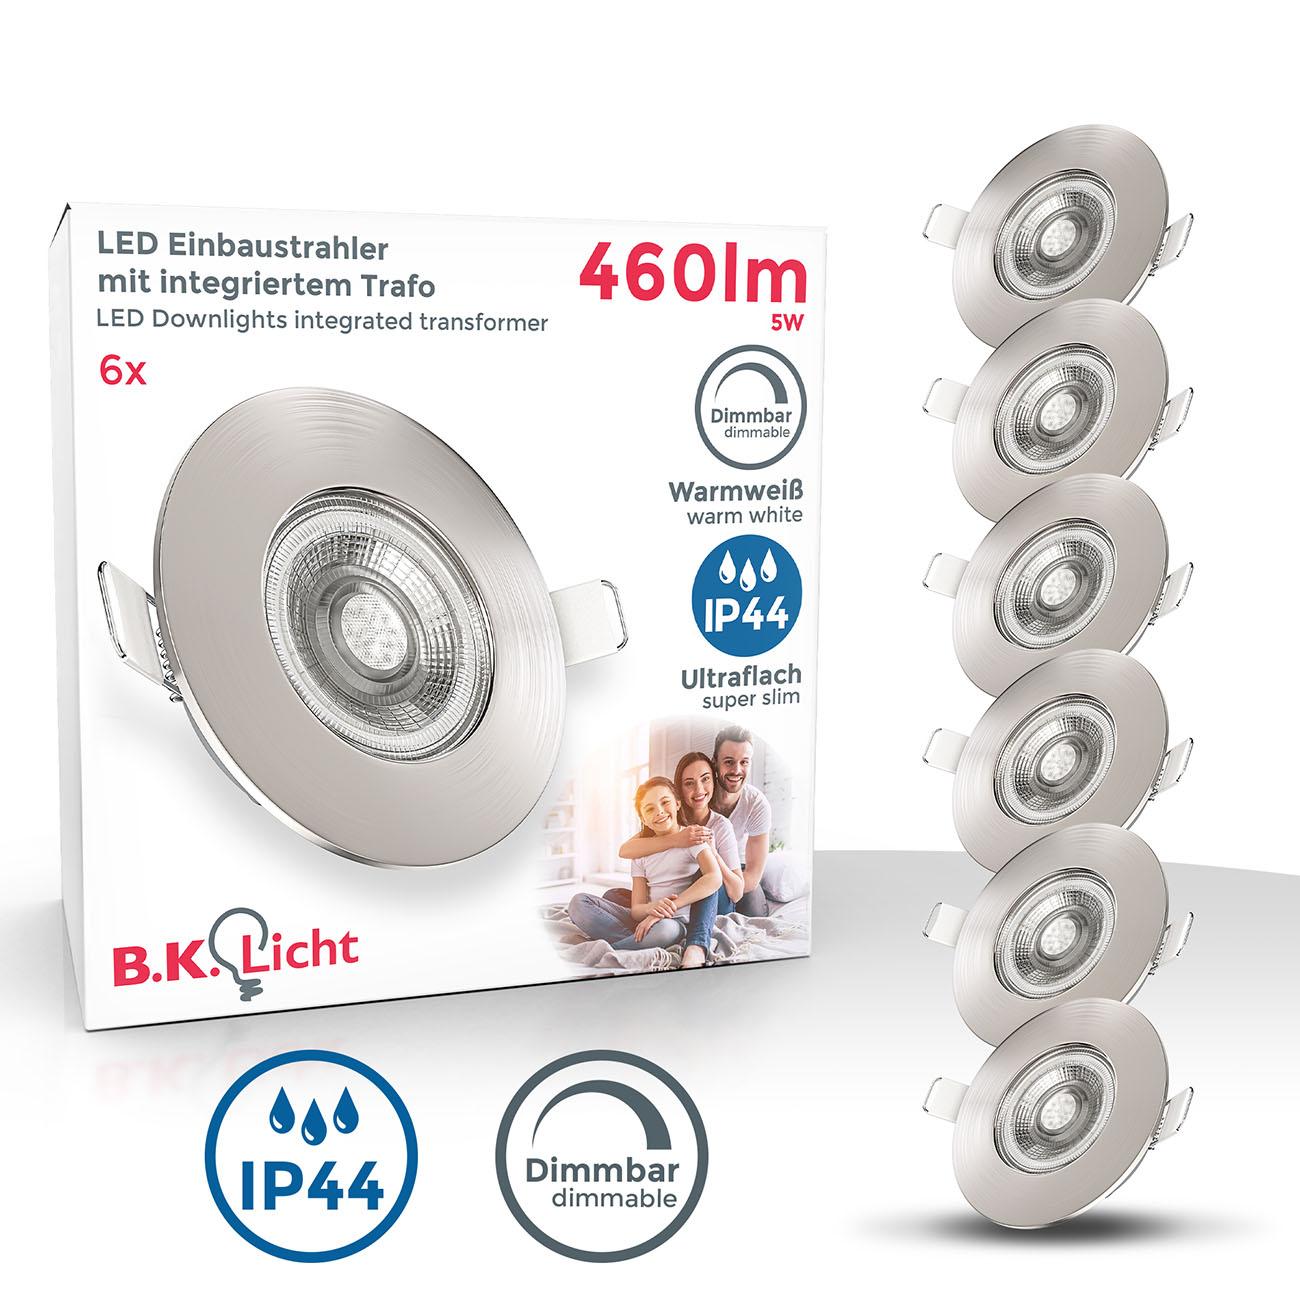 LED Einbaustrahler | Bad Einbauleuchte 6er SET | ultra flach 5W IP44 dimmbar